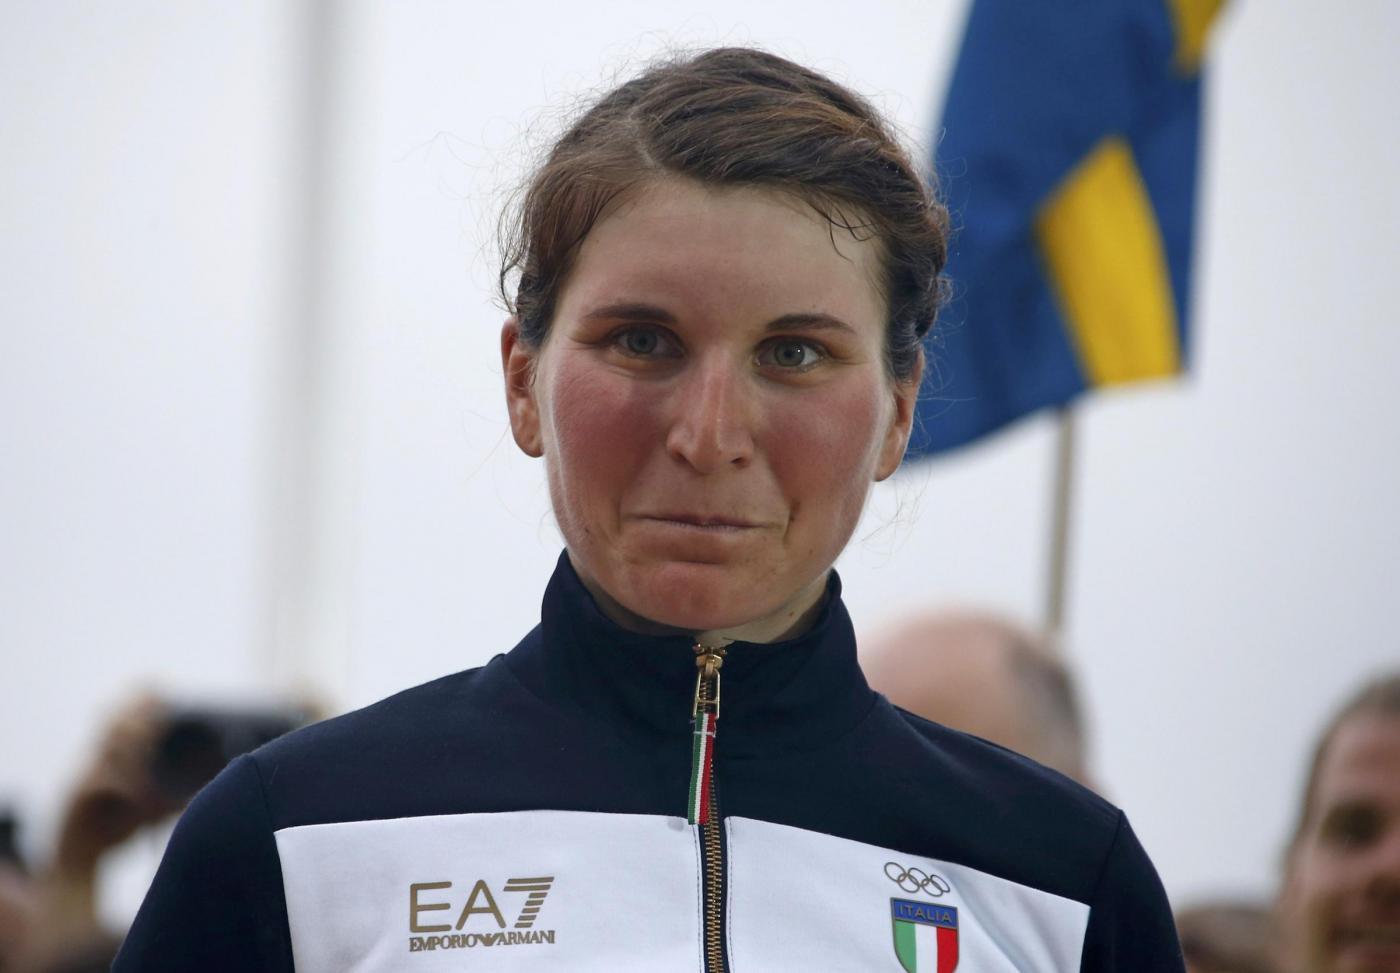 Olimpiadi Rio 2016: Bronzo nel ciclismo Elisa Longo Borghini